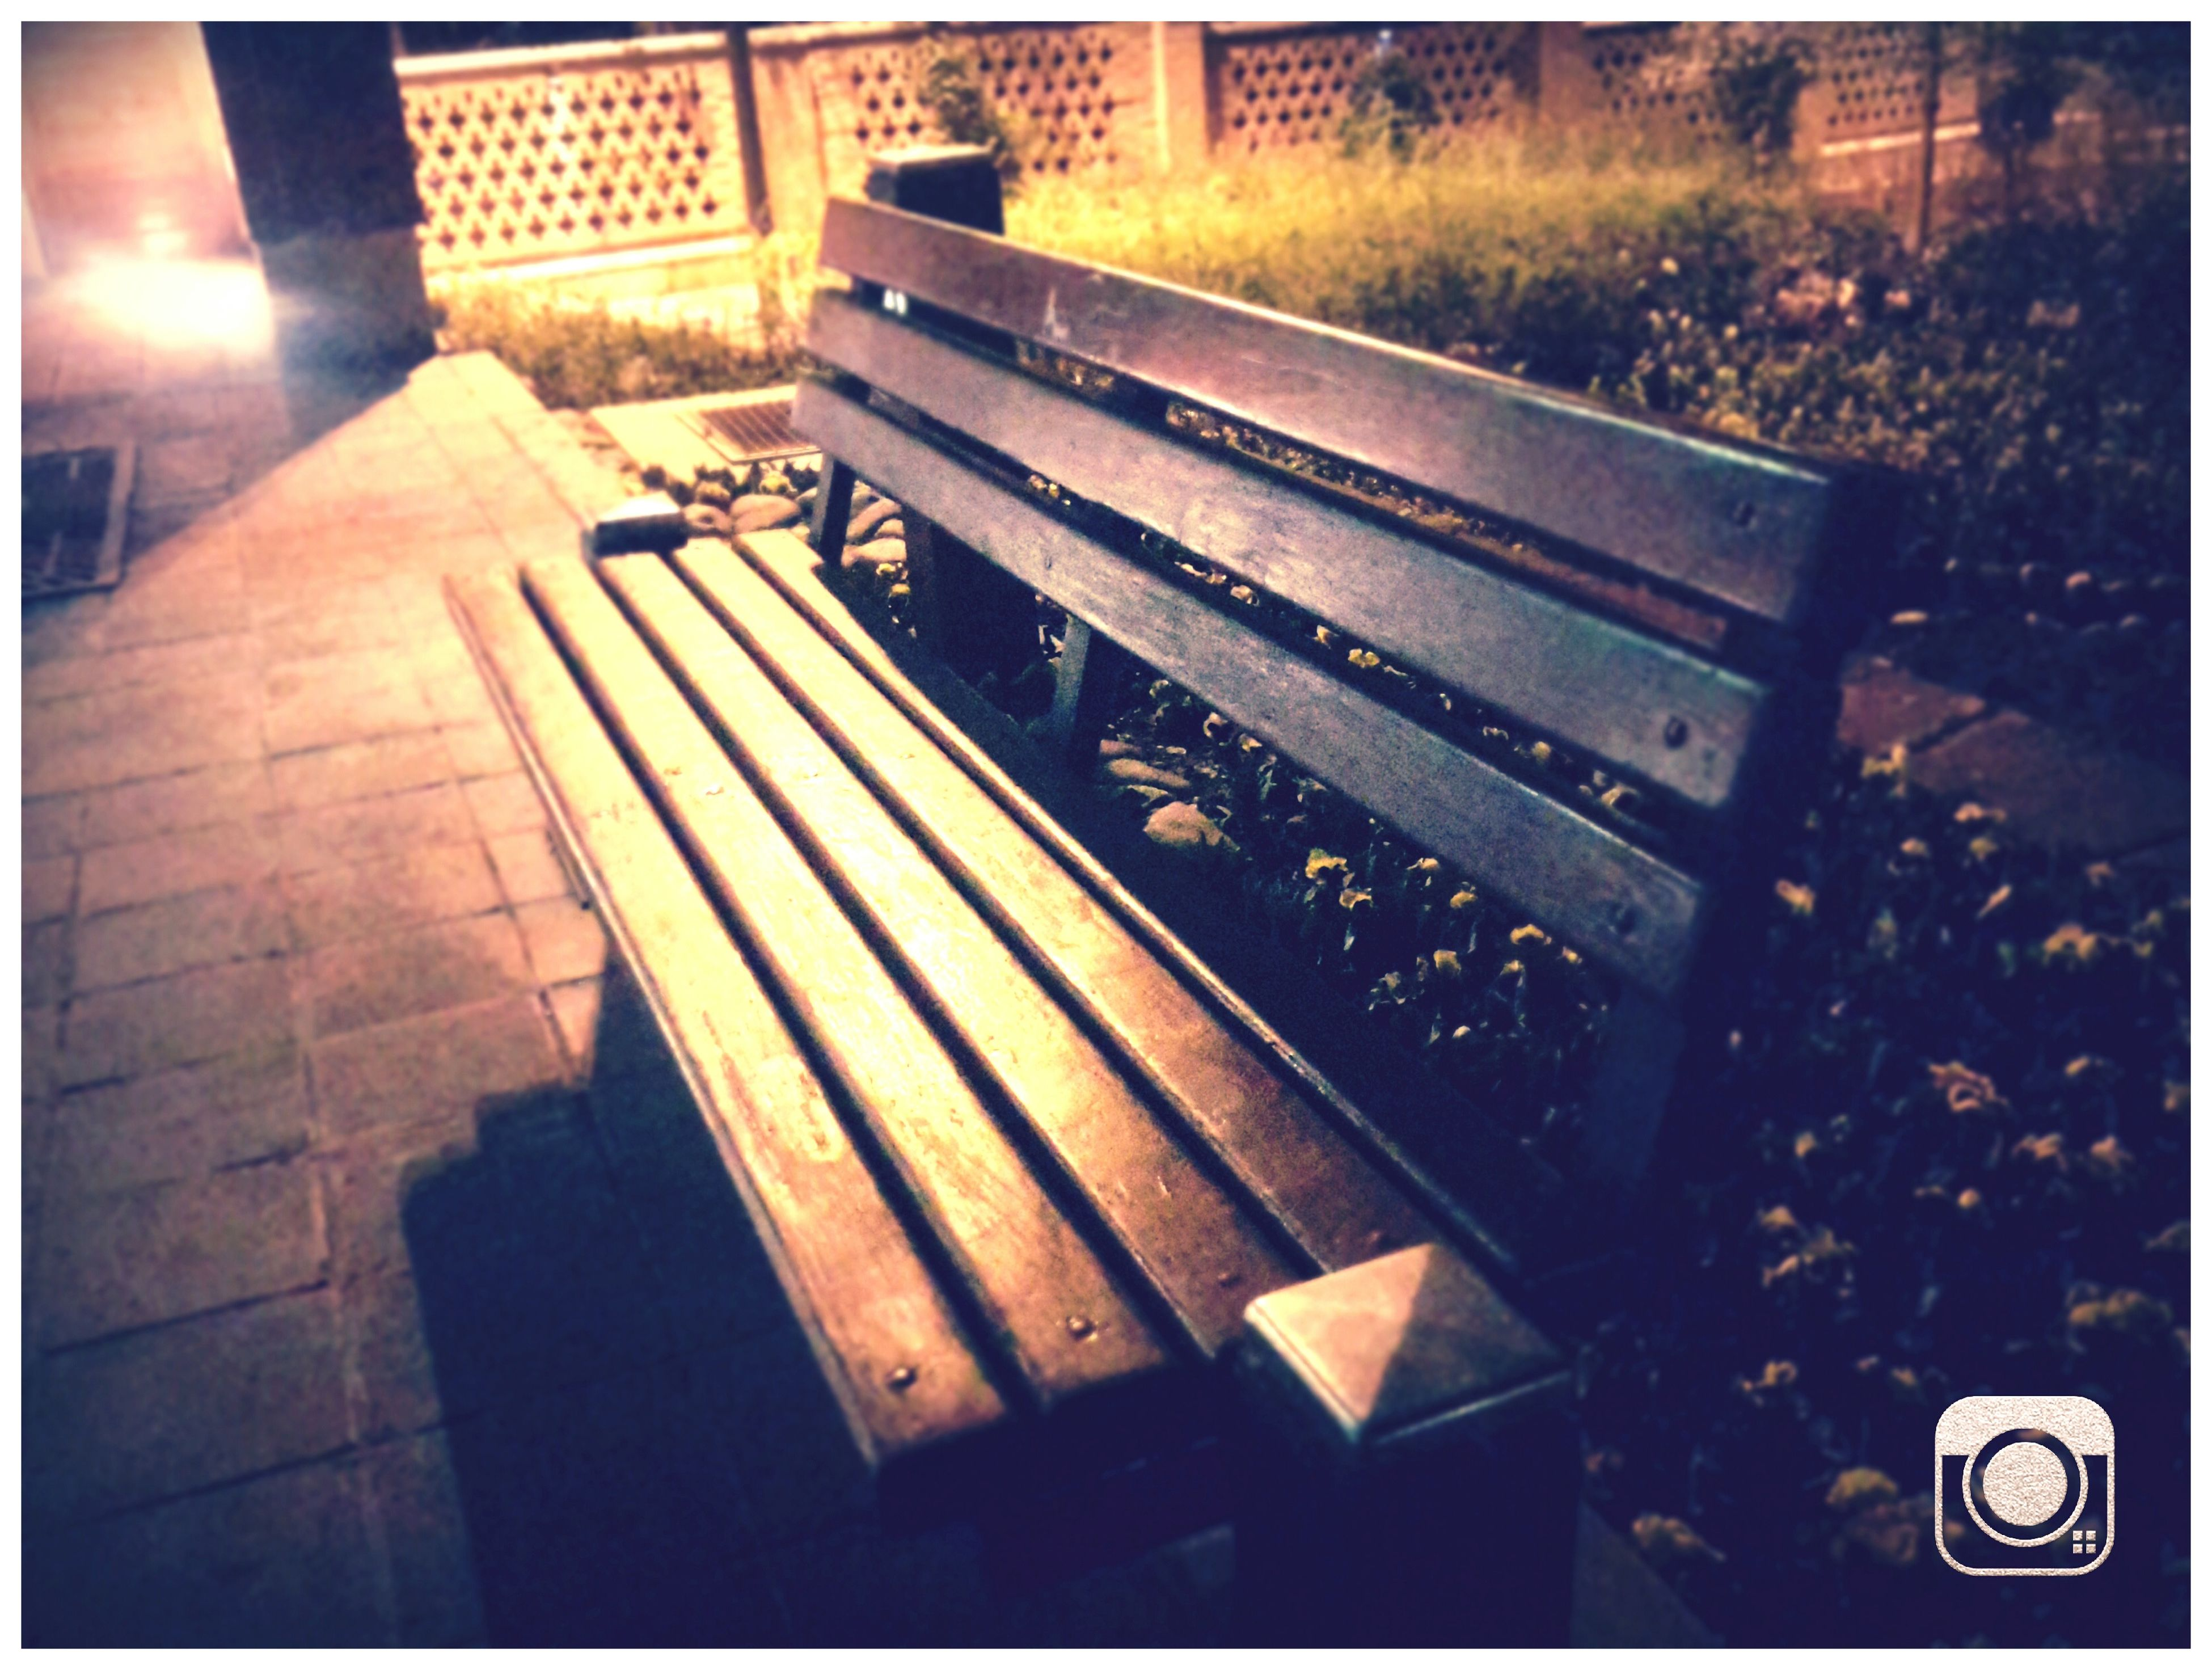 tehran Iranian Garden Beautiful Iran Iran Alonetime Alone In The City  Alone In The Dark Night